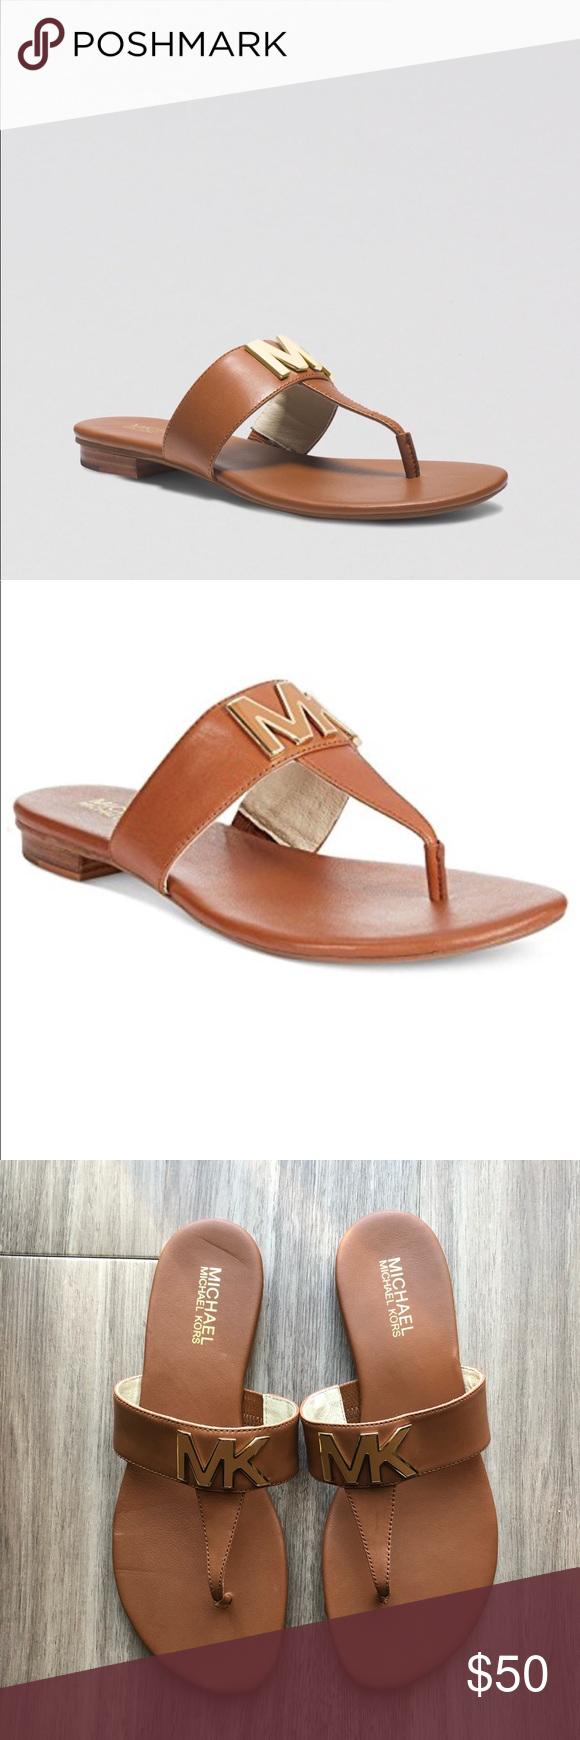 6b88a30e1cd8 Michael Michael Kira Hayley Leather Thong Sandals Michael Michael Kors  Hayley leather thong flat sandals. Mandarin